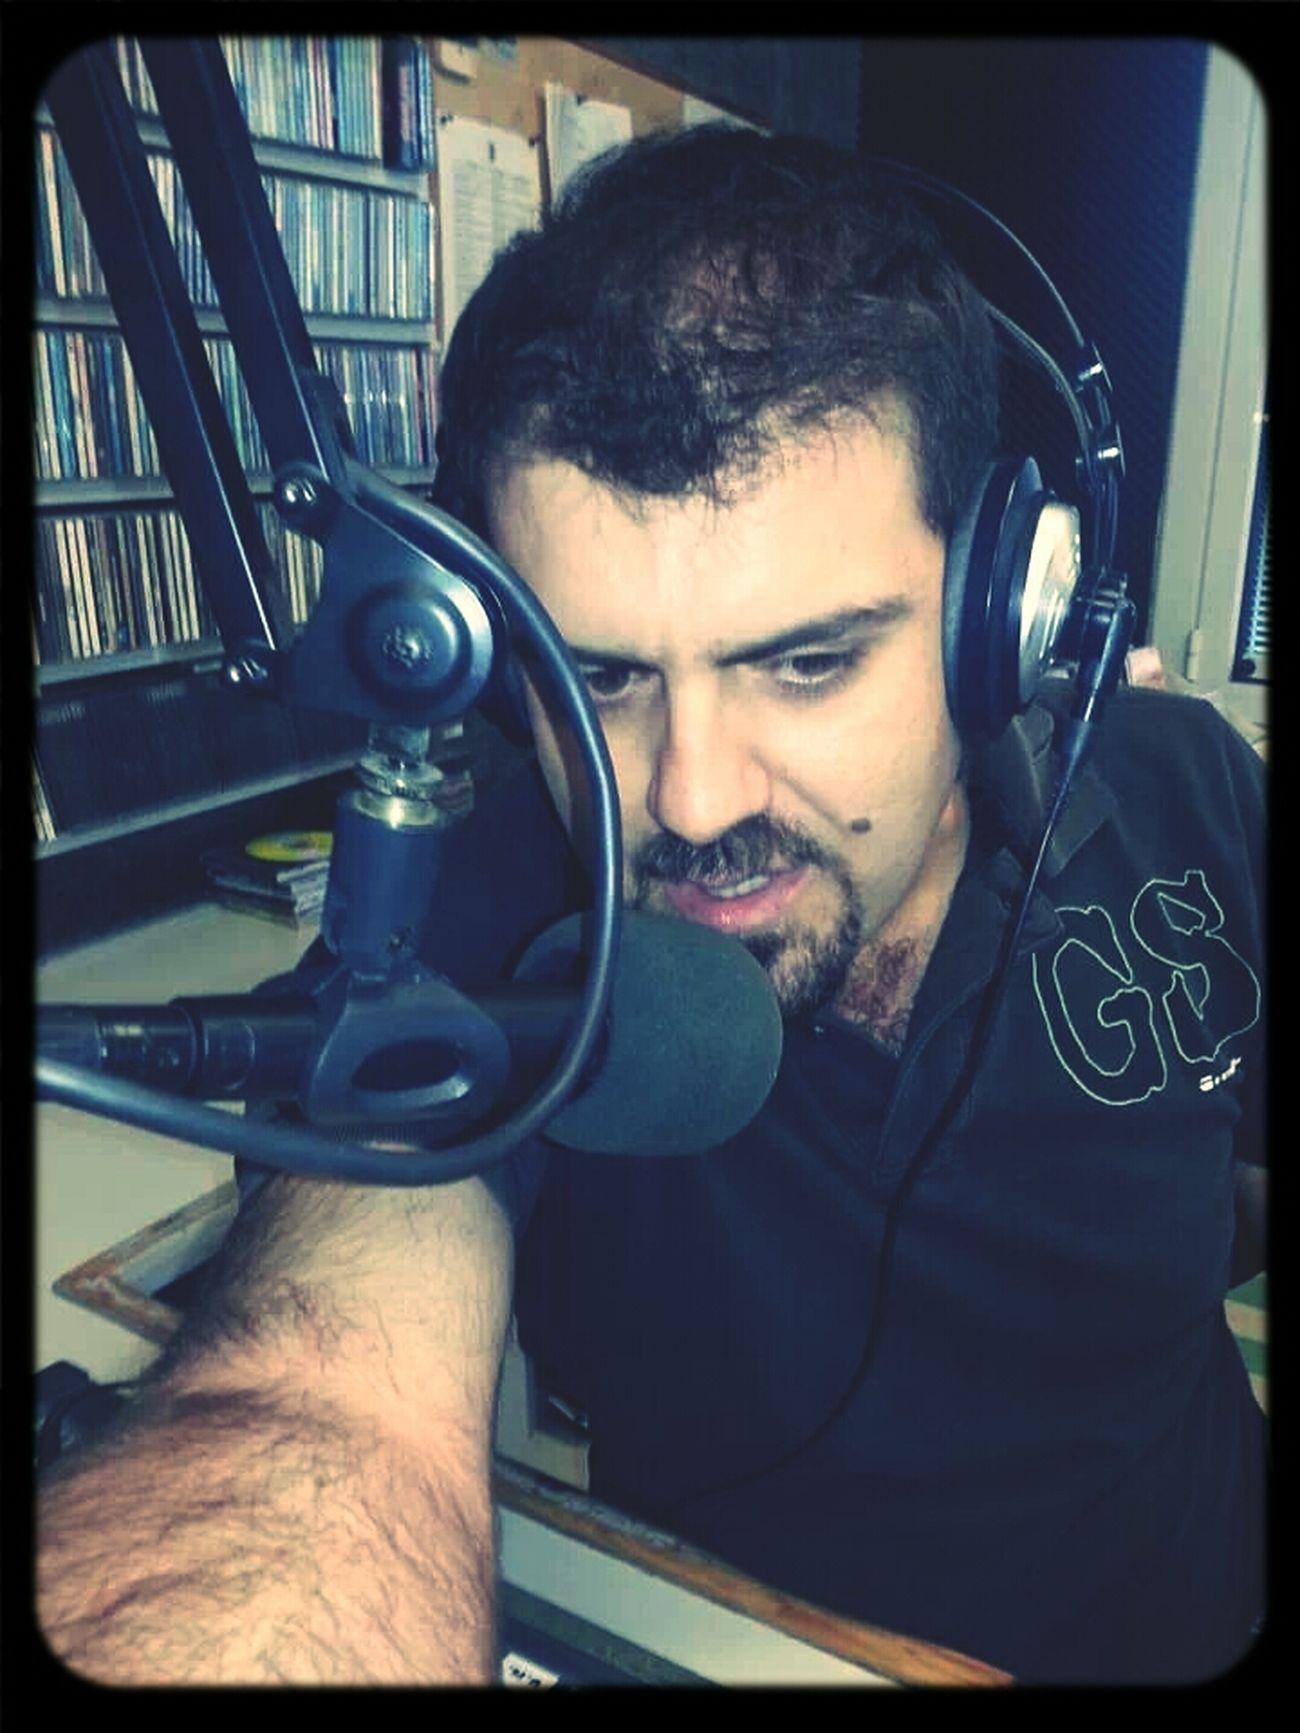 Me gusta hacer radio! Liberalamusica Musica Laradio Radio @radioplatjadaro